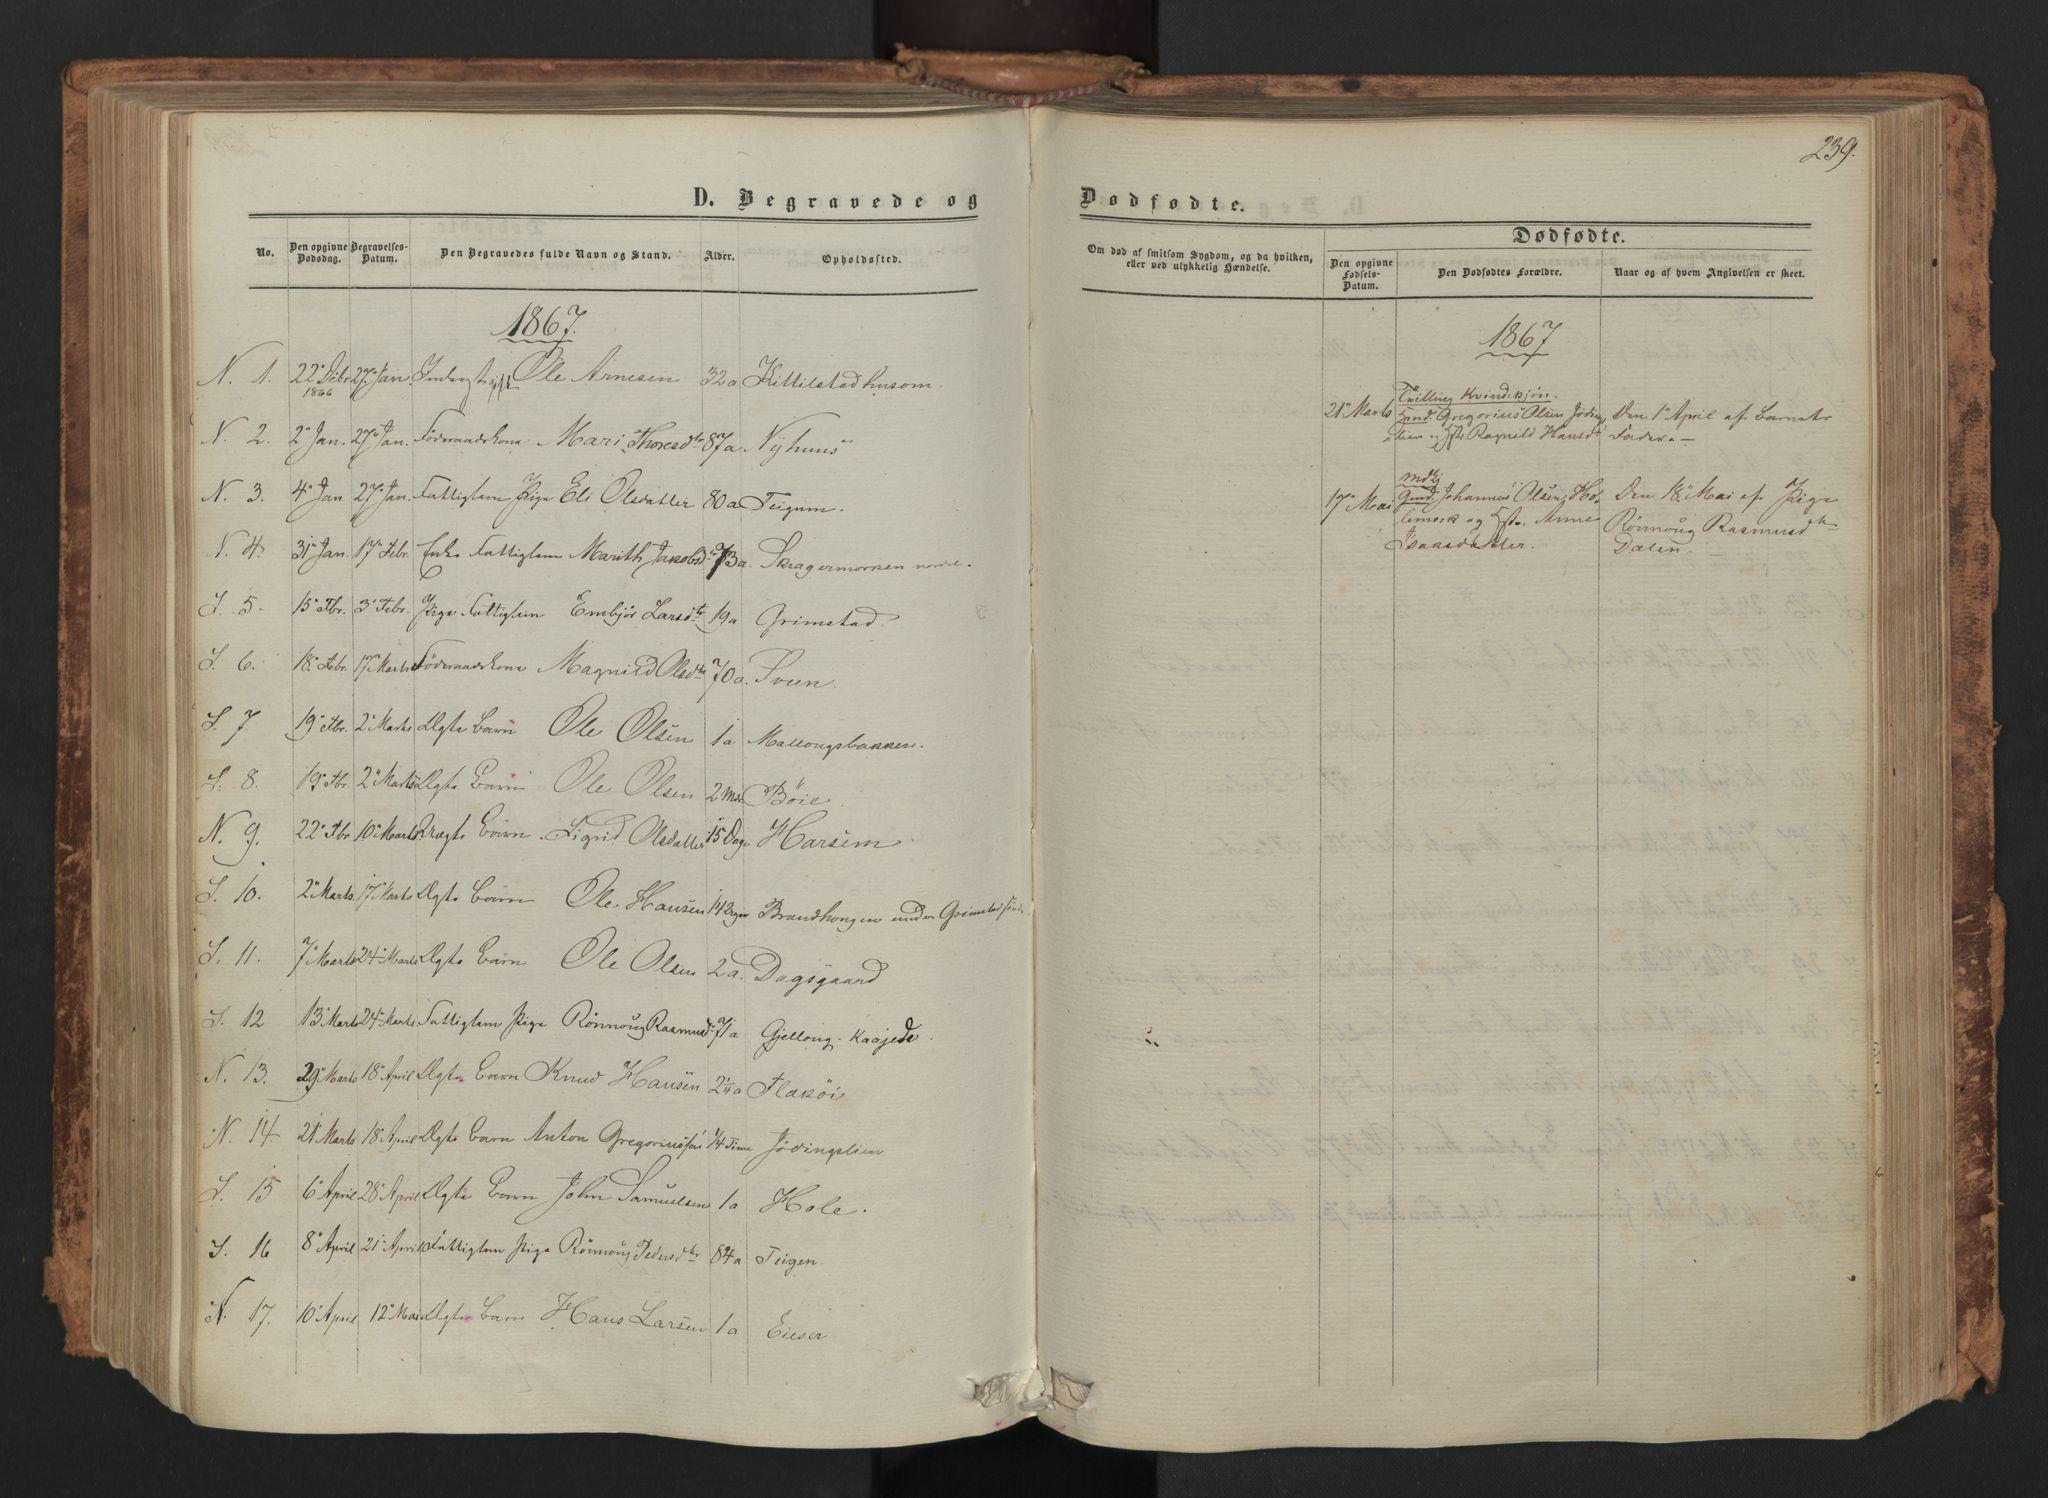 SAH, Skjåk prestekontor, Ministerialbok nr. 1, 1863-1879, s. 239